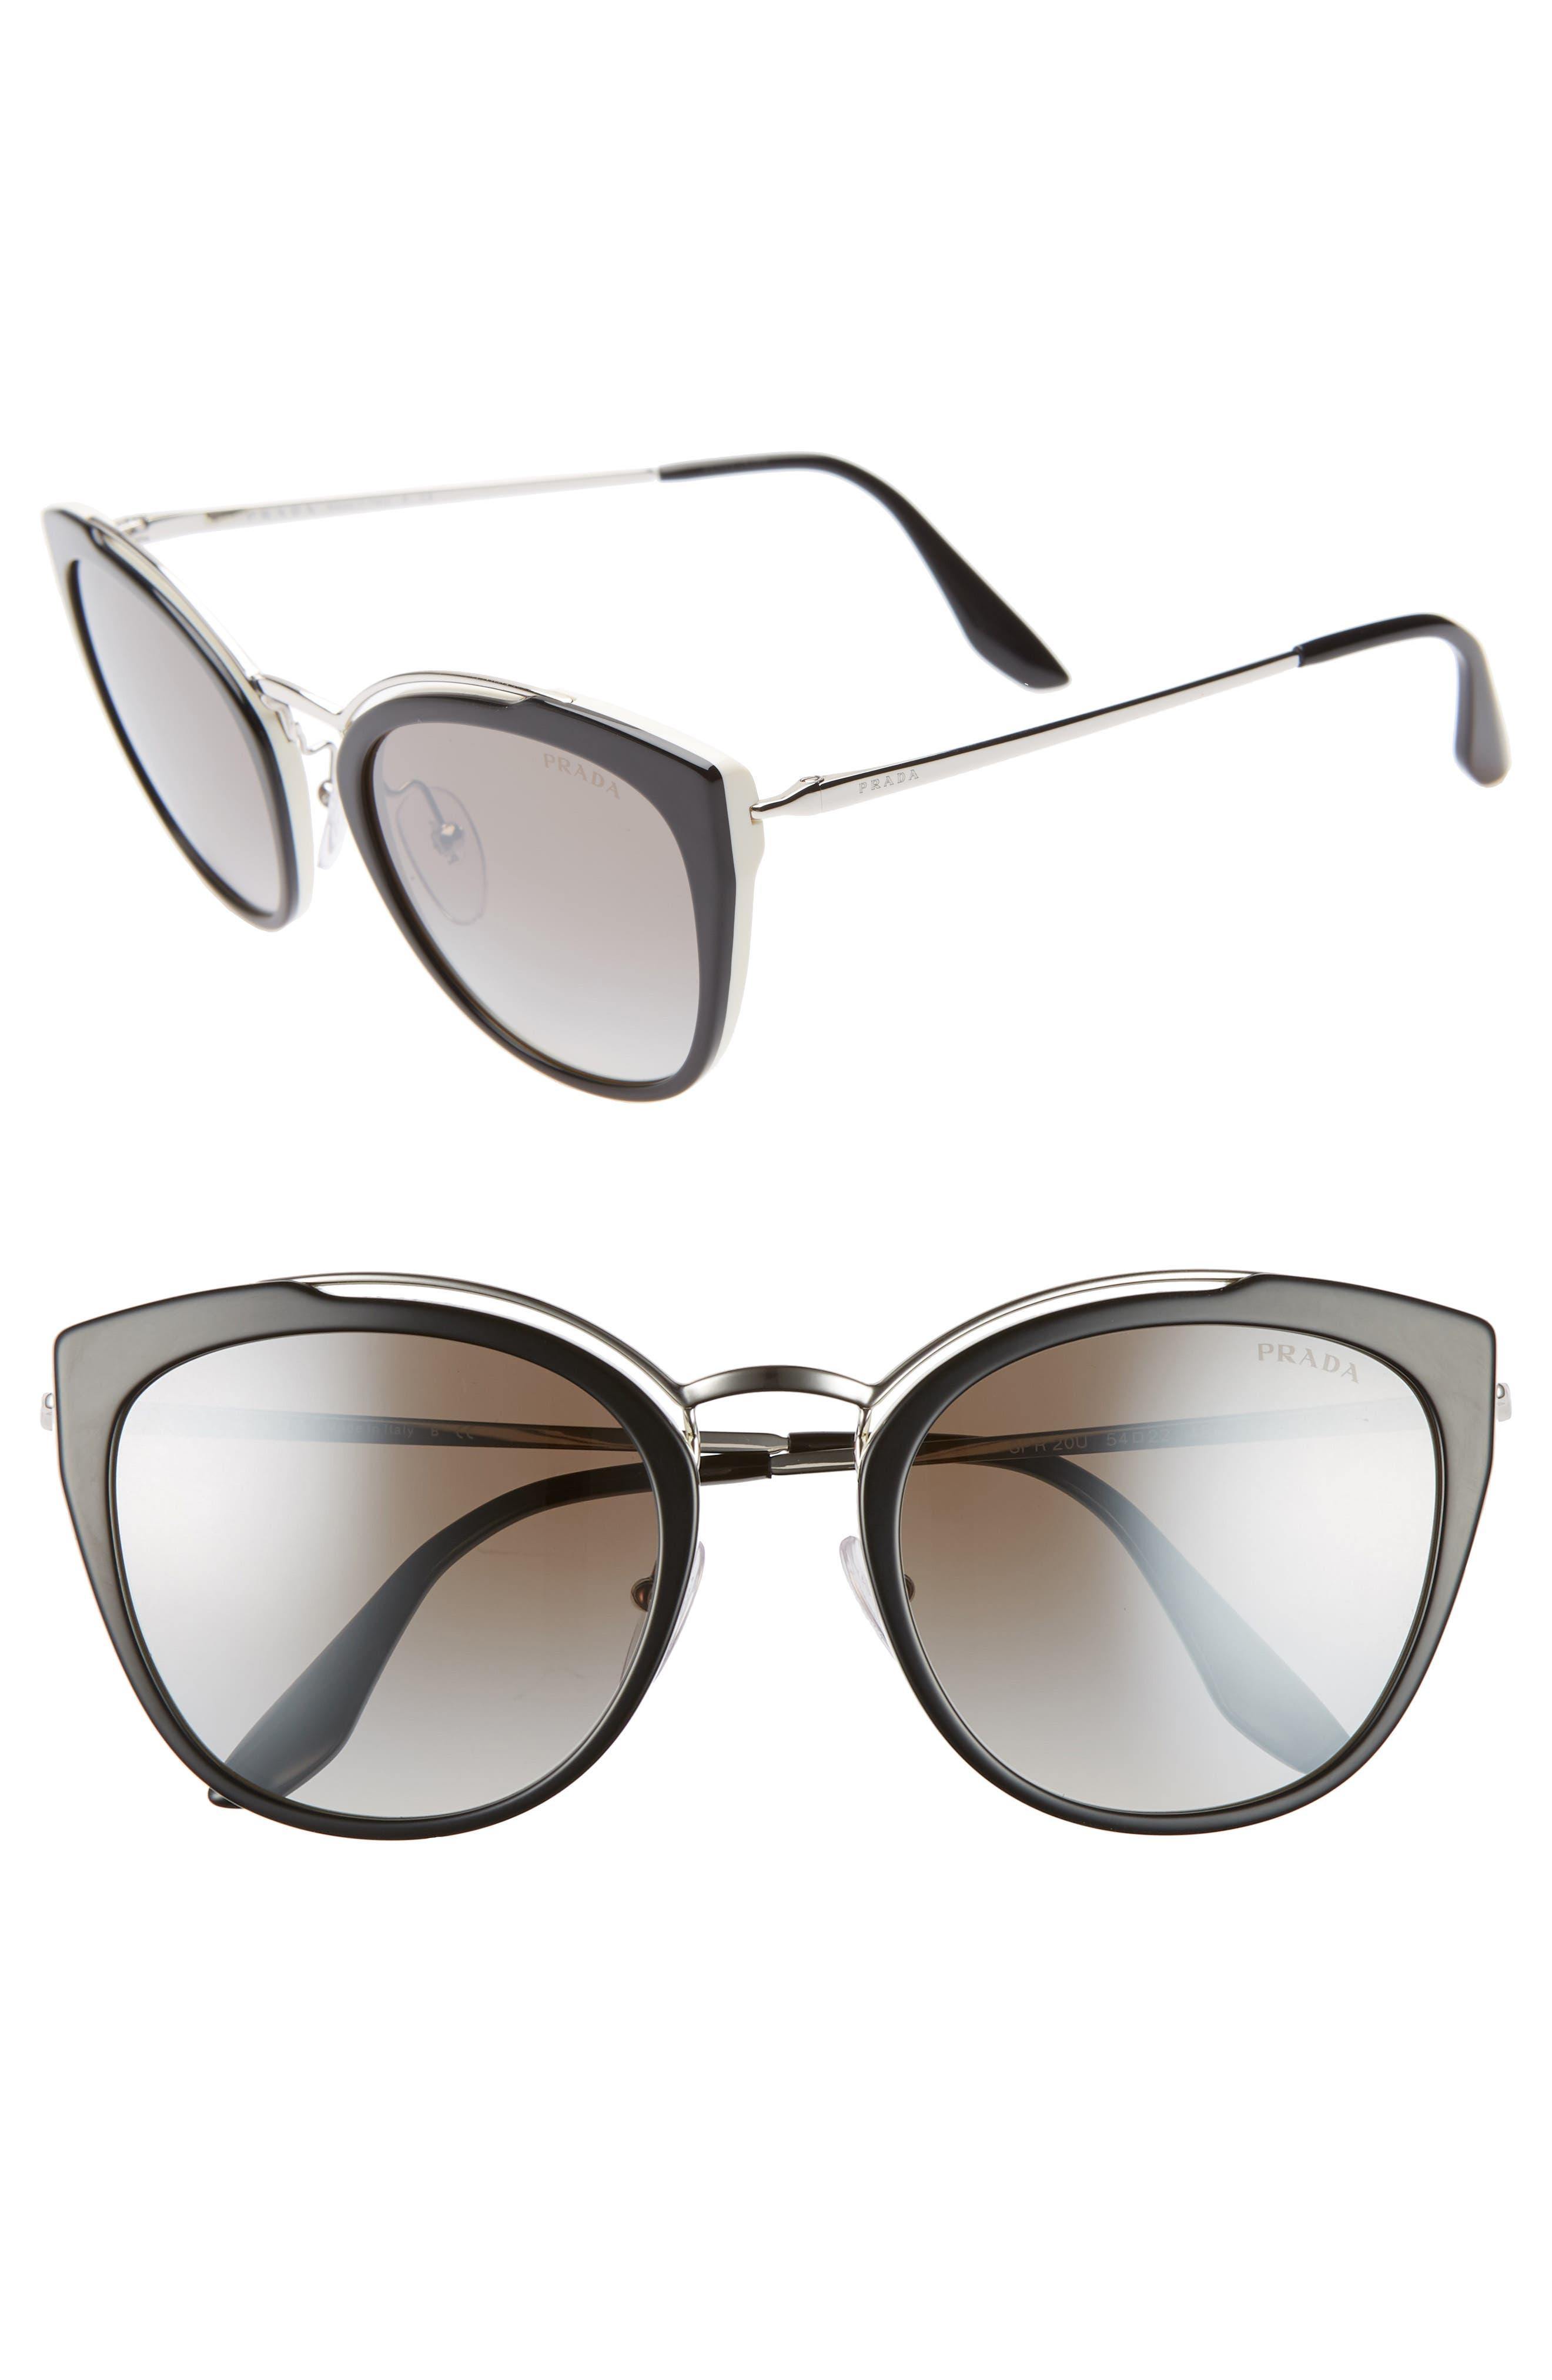 PRADA 54mm Gradient Cat Eye Sunglasses, Main, color, BLACK/ SILVER GRADIENT MIRROR